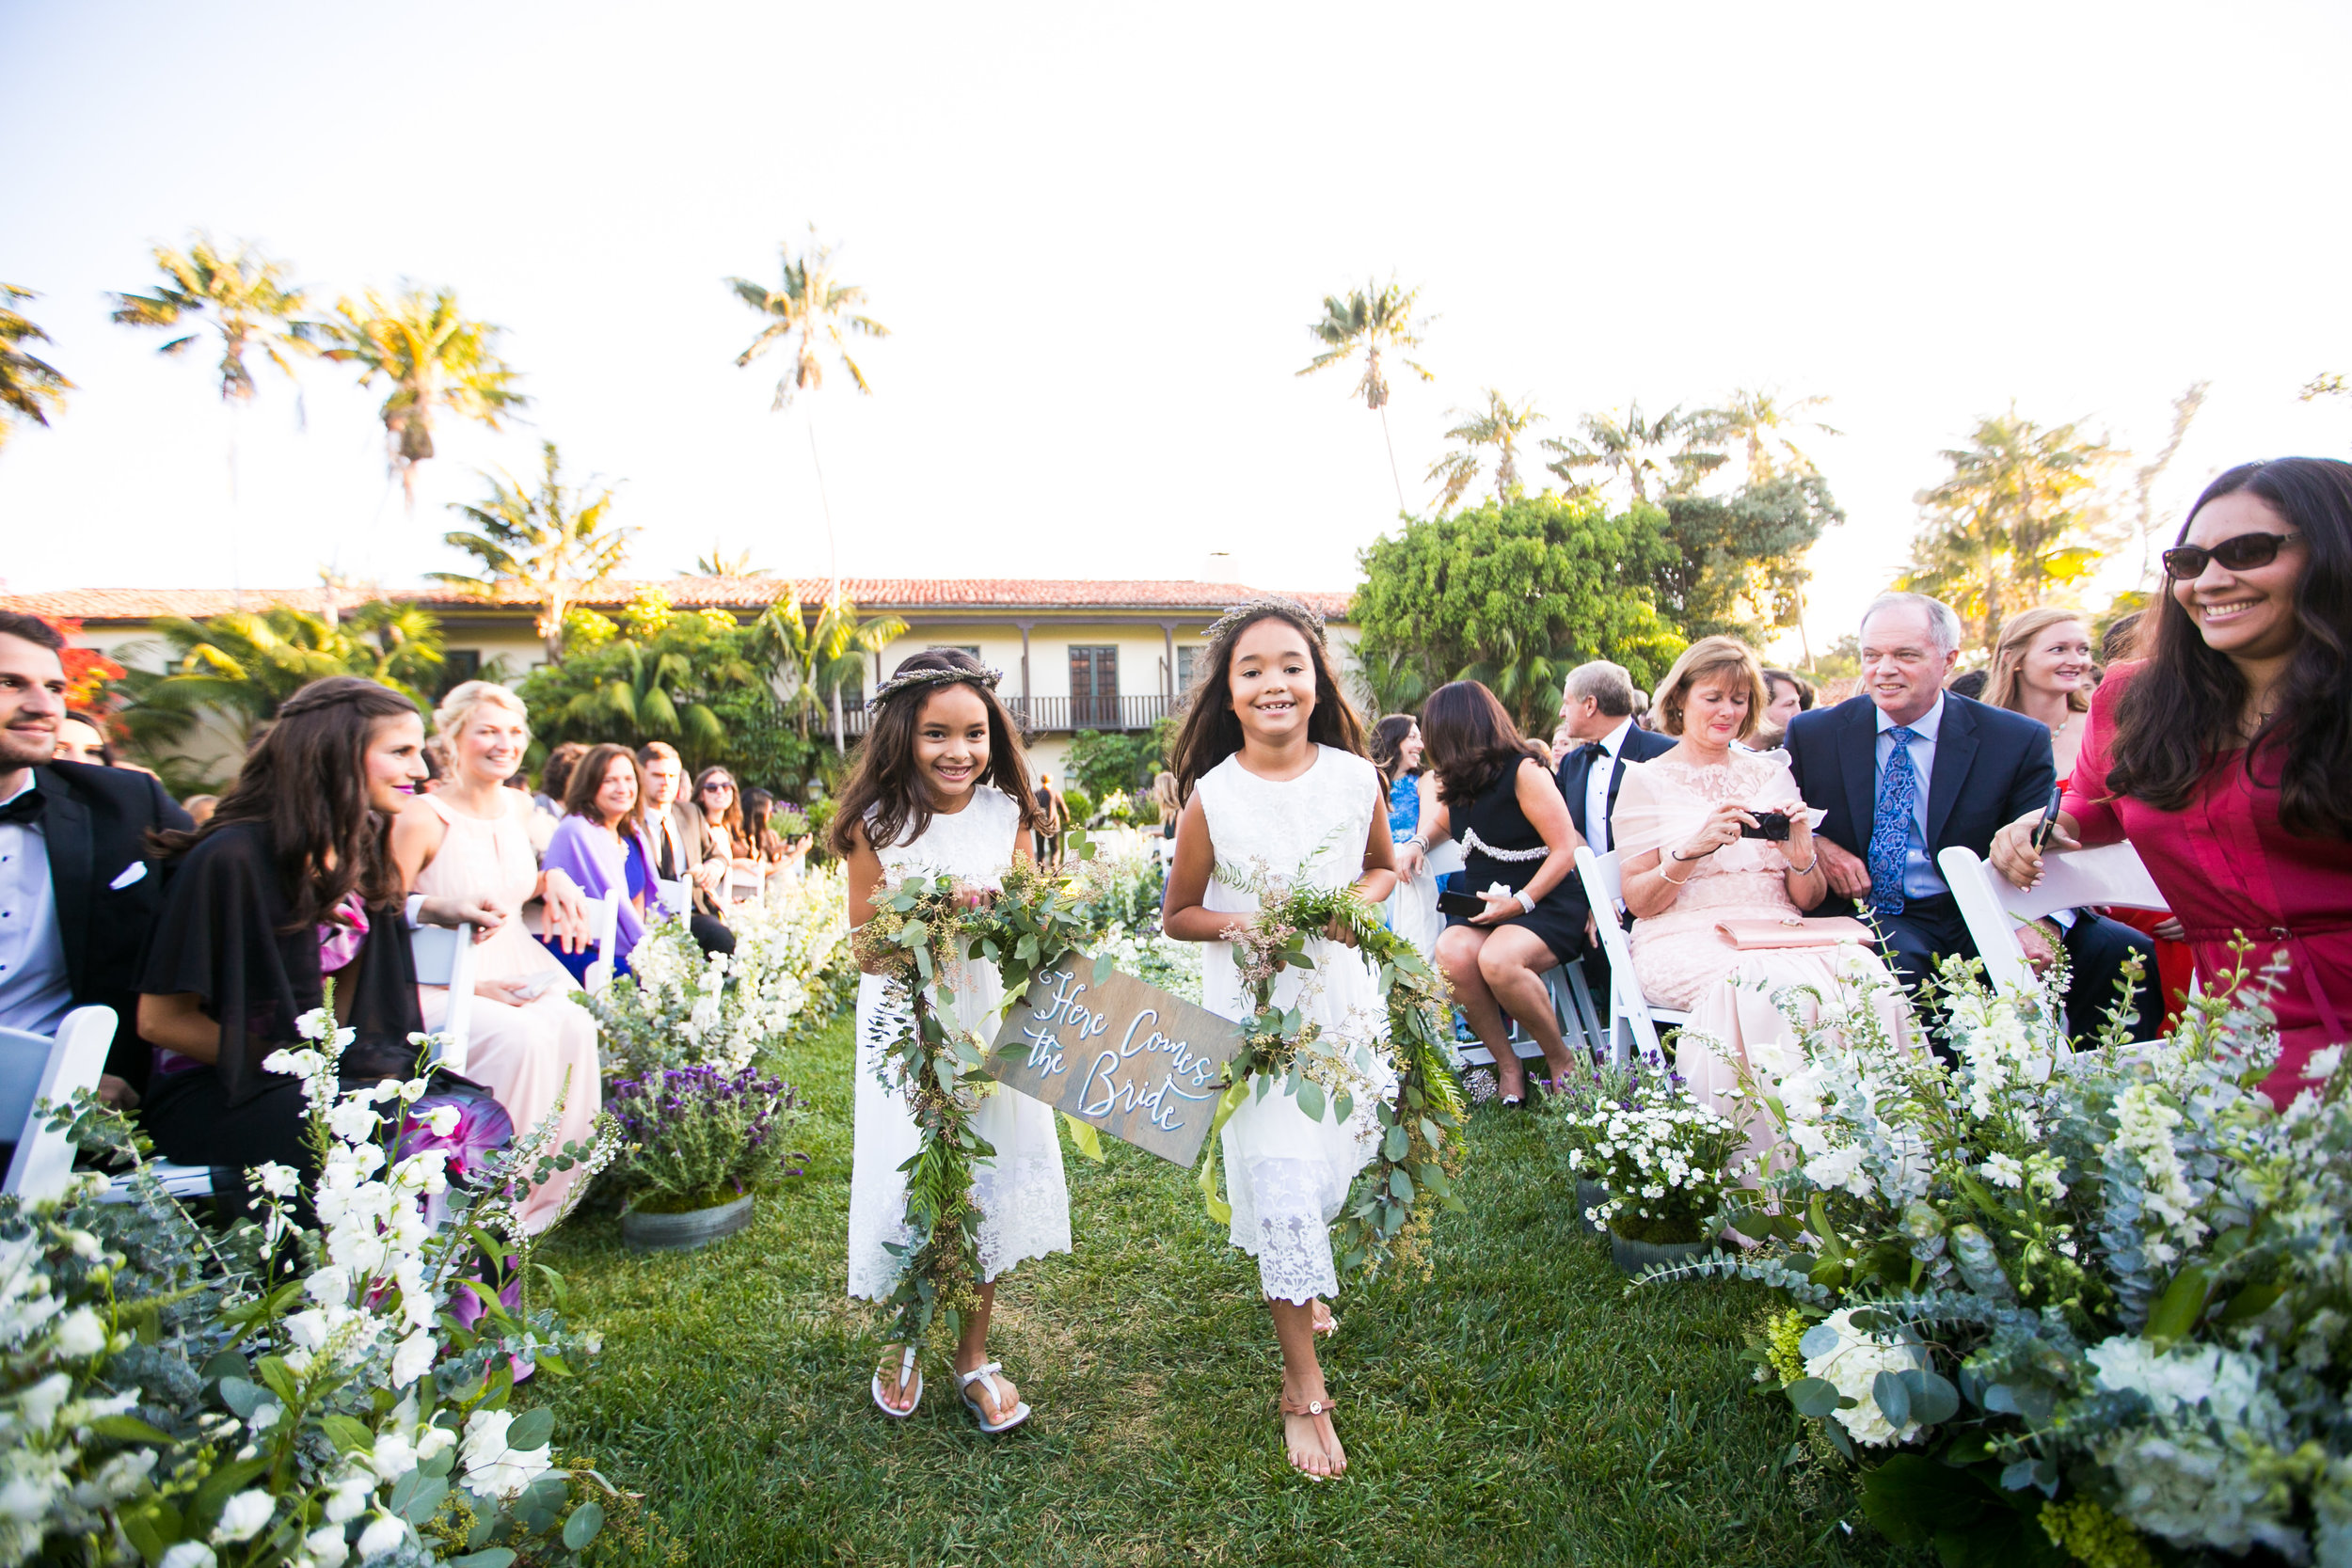 www.santabarbarawedding.com   Four Seasons Santa Barbara   Levine Fox Events   Callaway Gable Photo   Flower Girls